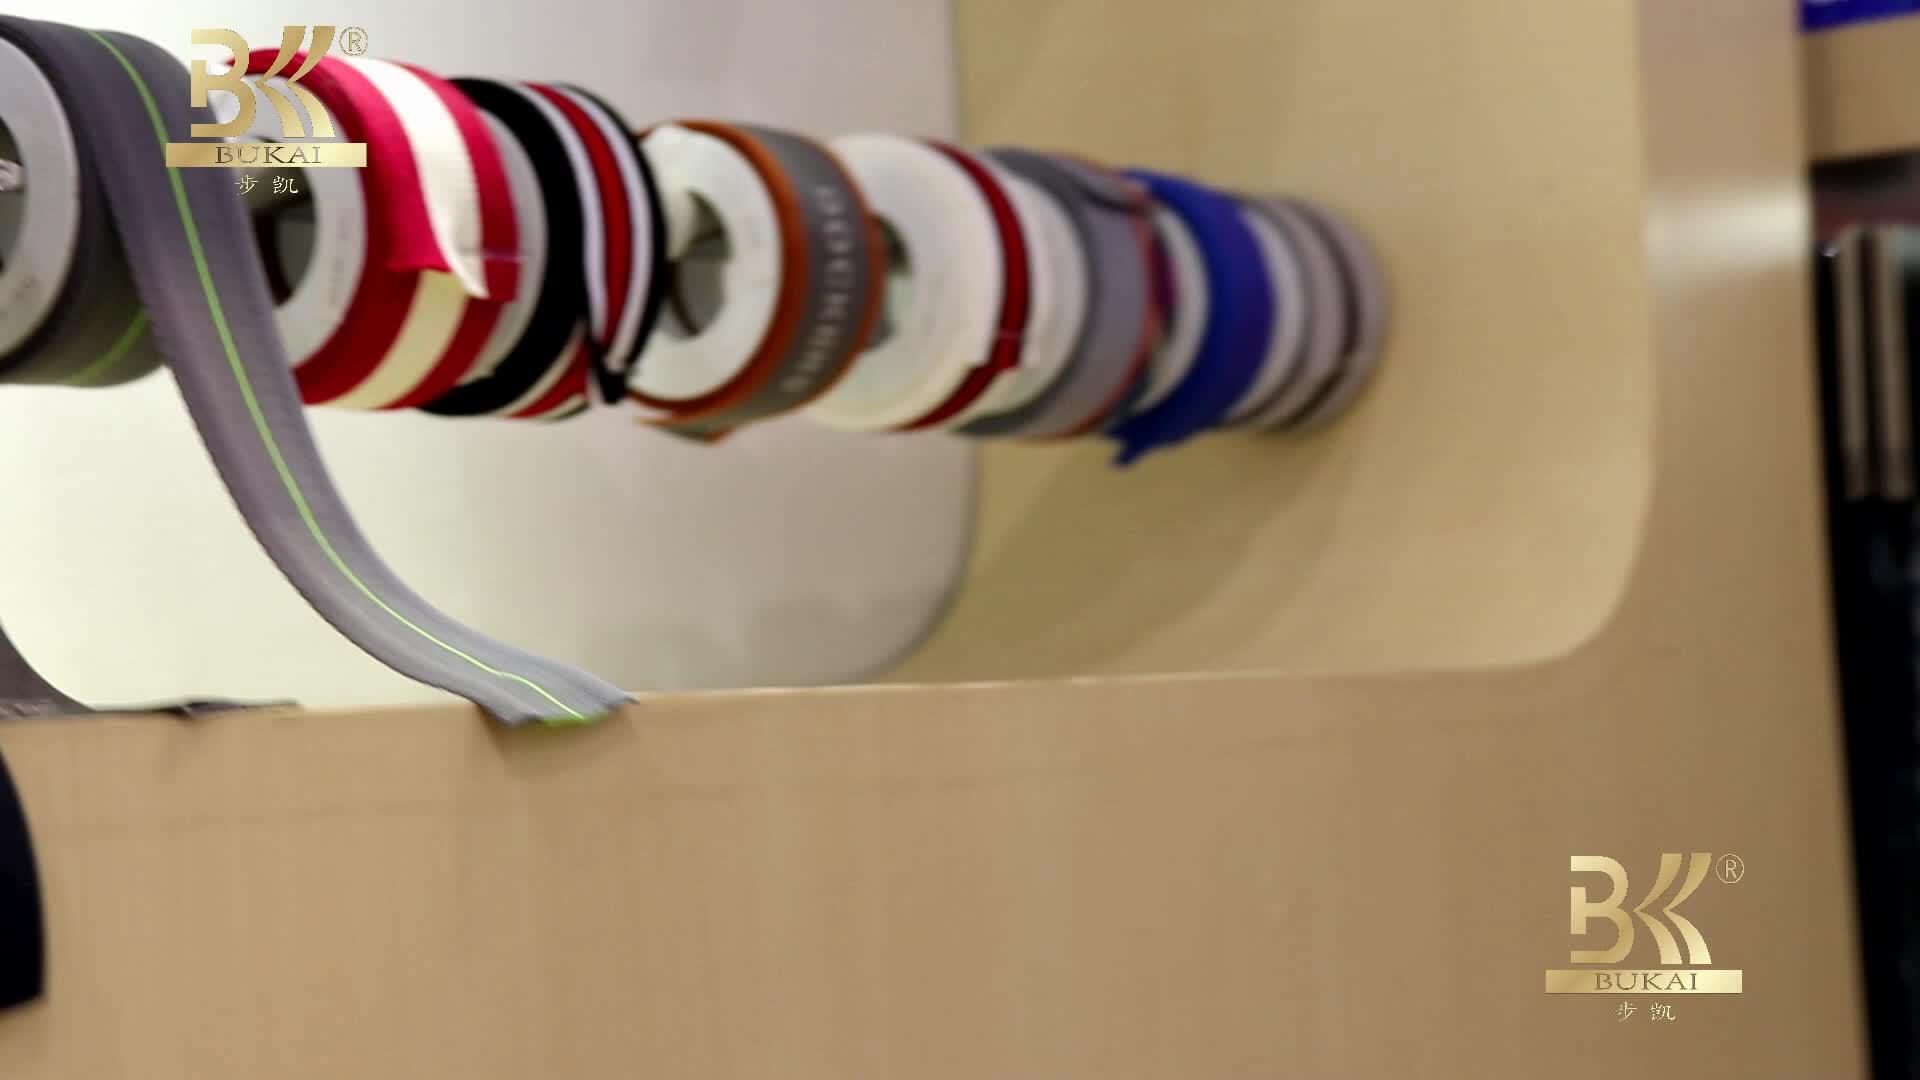 Bukai Fashions Herringbone printed custom waistband lining fabric for pants